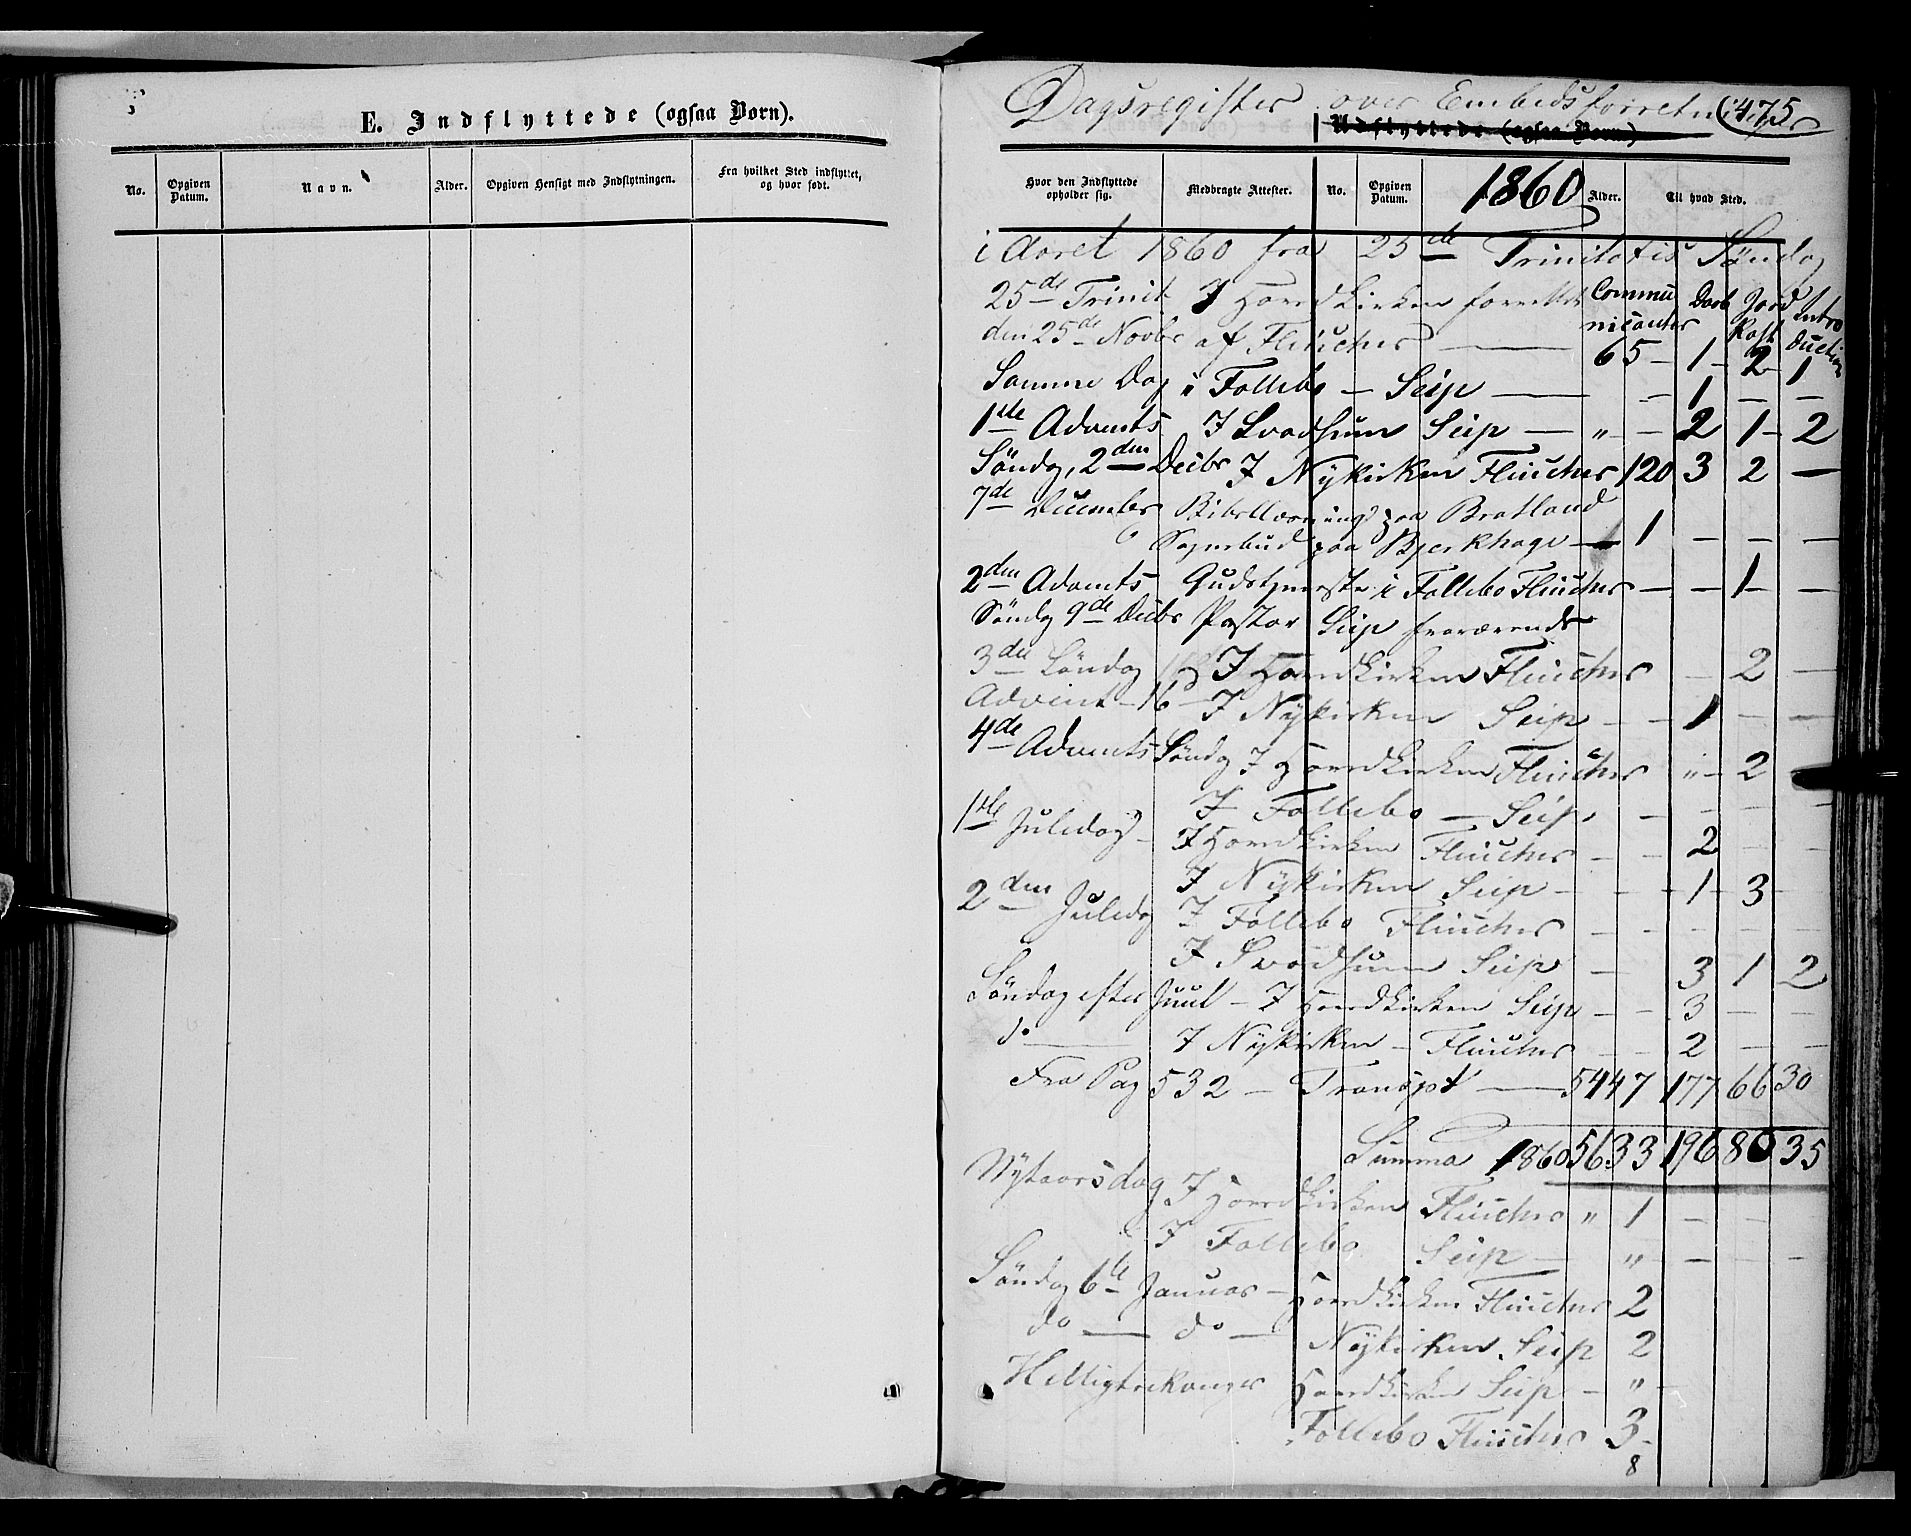 SAH, Gausdal prestekontor, Ministerialbok nr. 8, 1850-1861, s. 475